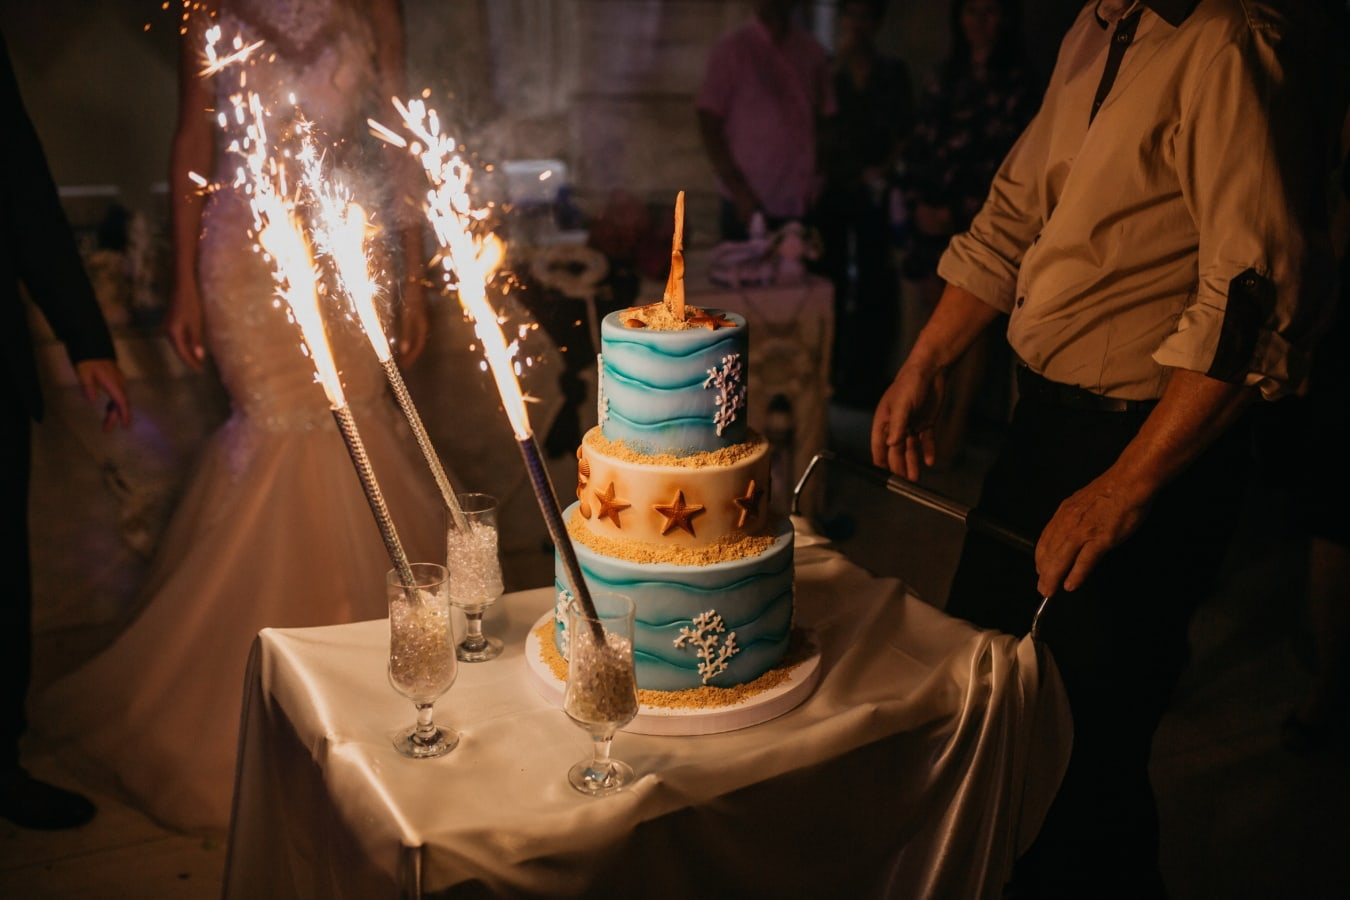 fancy, wedding cake, bartender, candle, flame, people, wedding, celebration, woman, candlelight